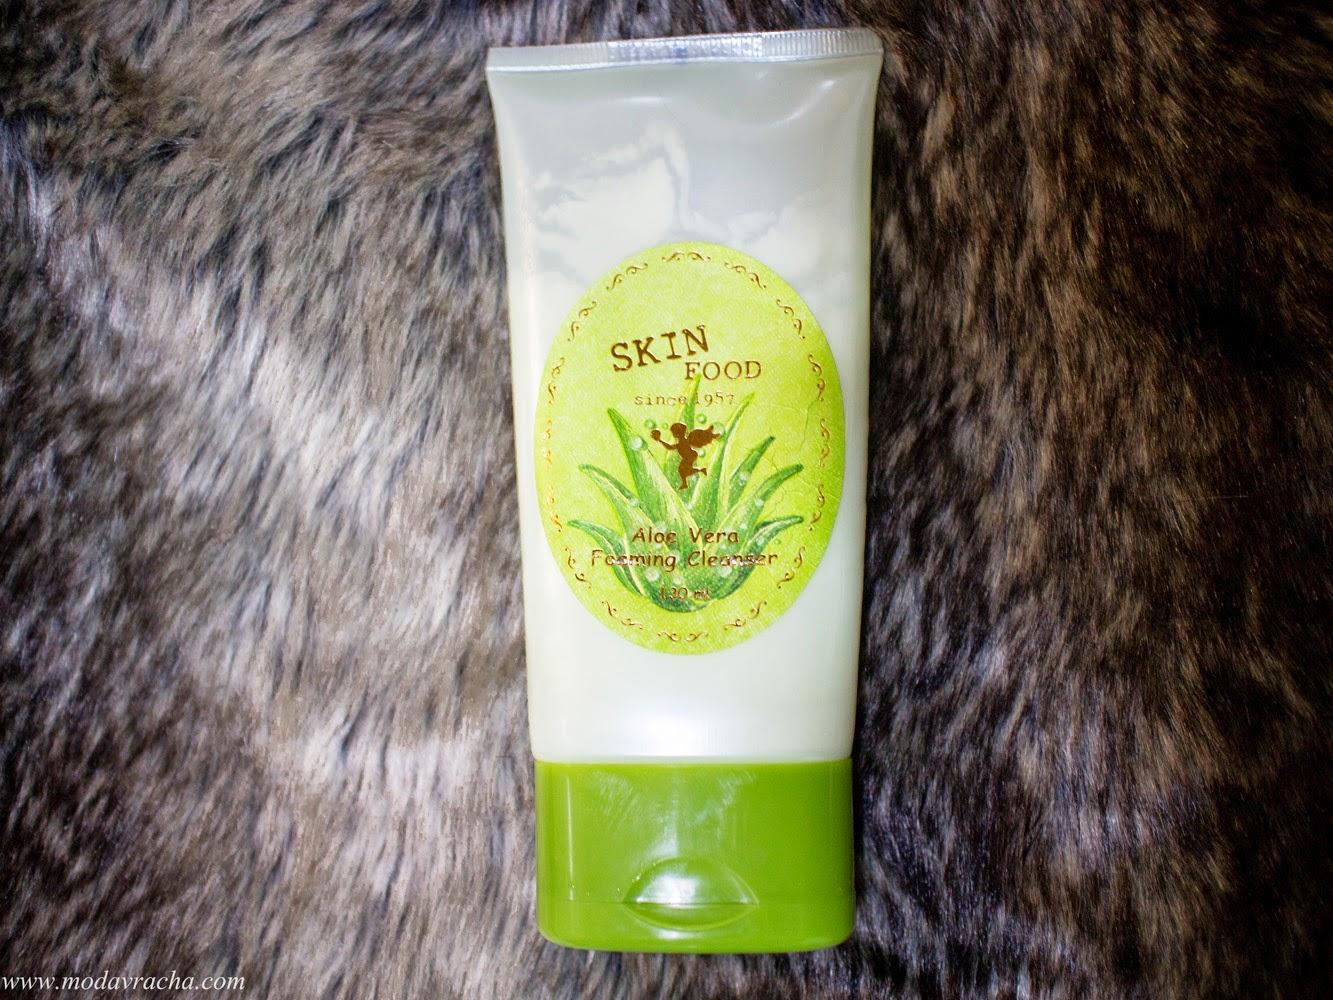 Korean skin care cleansing product SkinFood Aloe Vera Foaming Cleanser Review